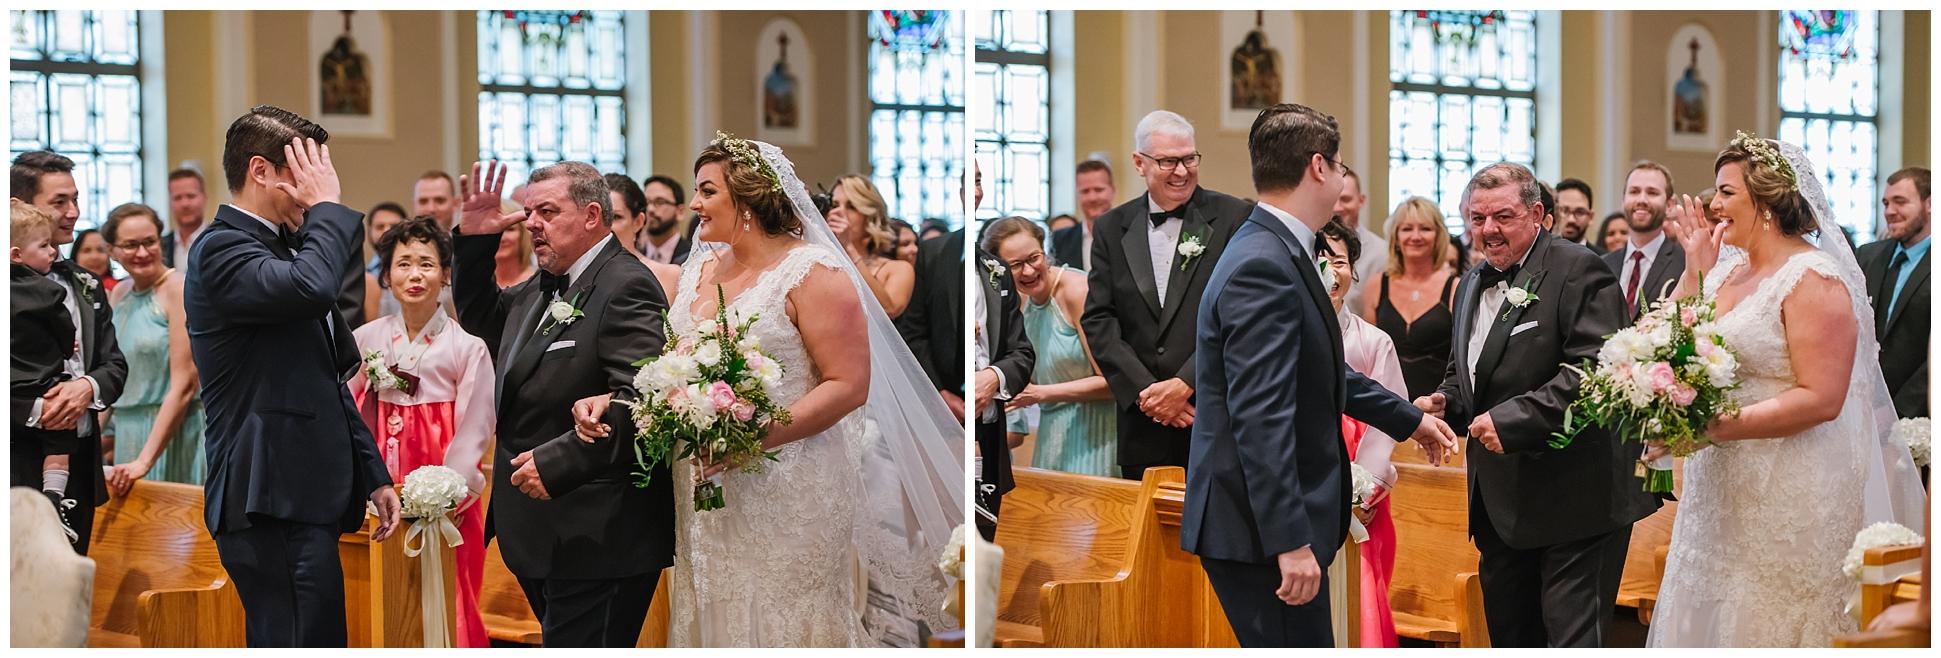 st-pete-wedding-photographer-italian-romance-theme-rustic-flower-crown_0395.jpg